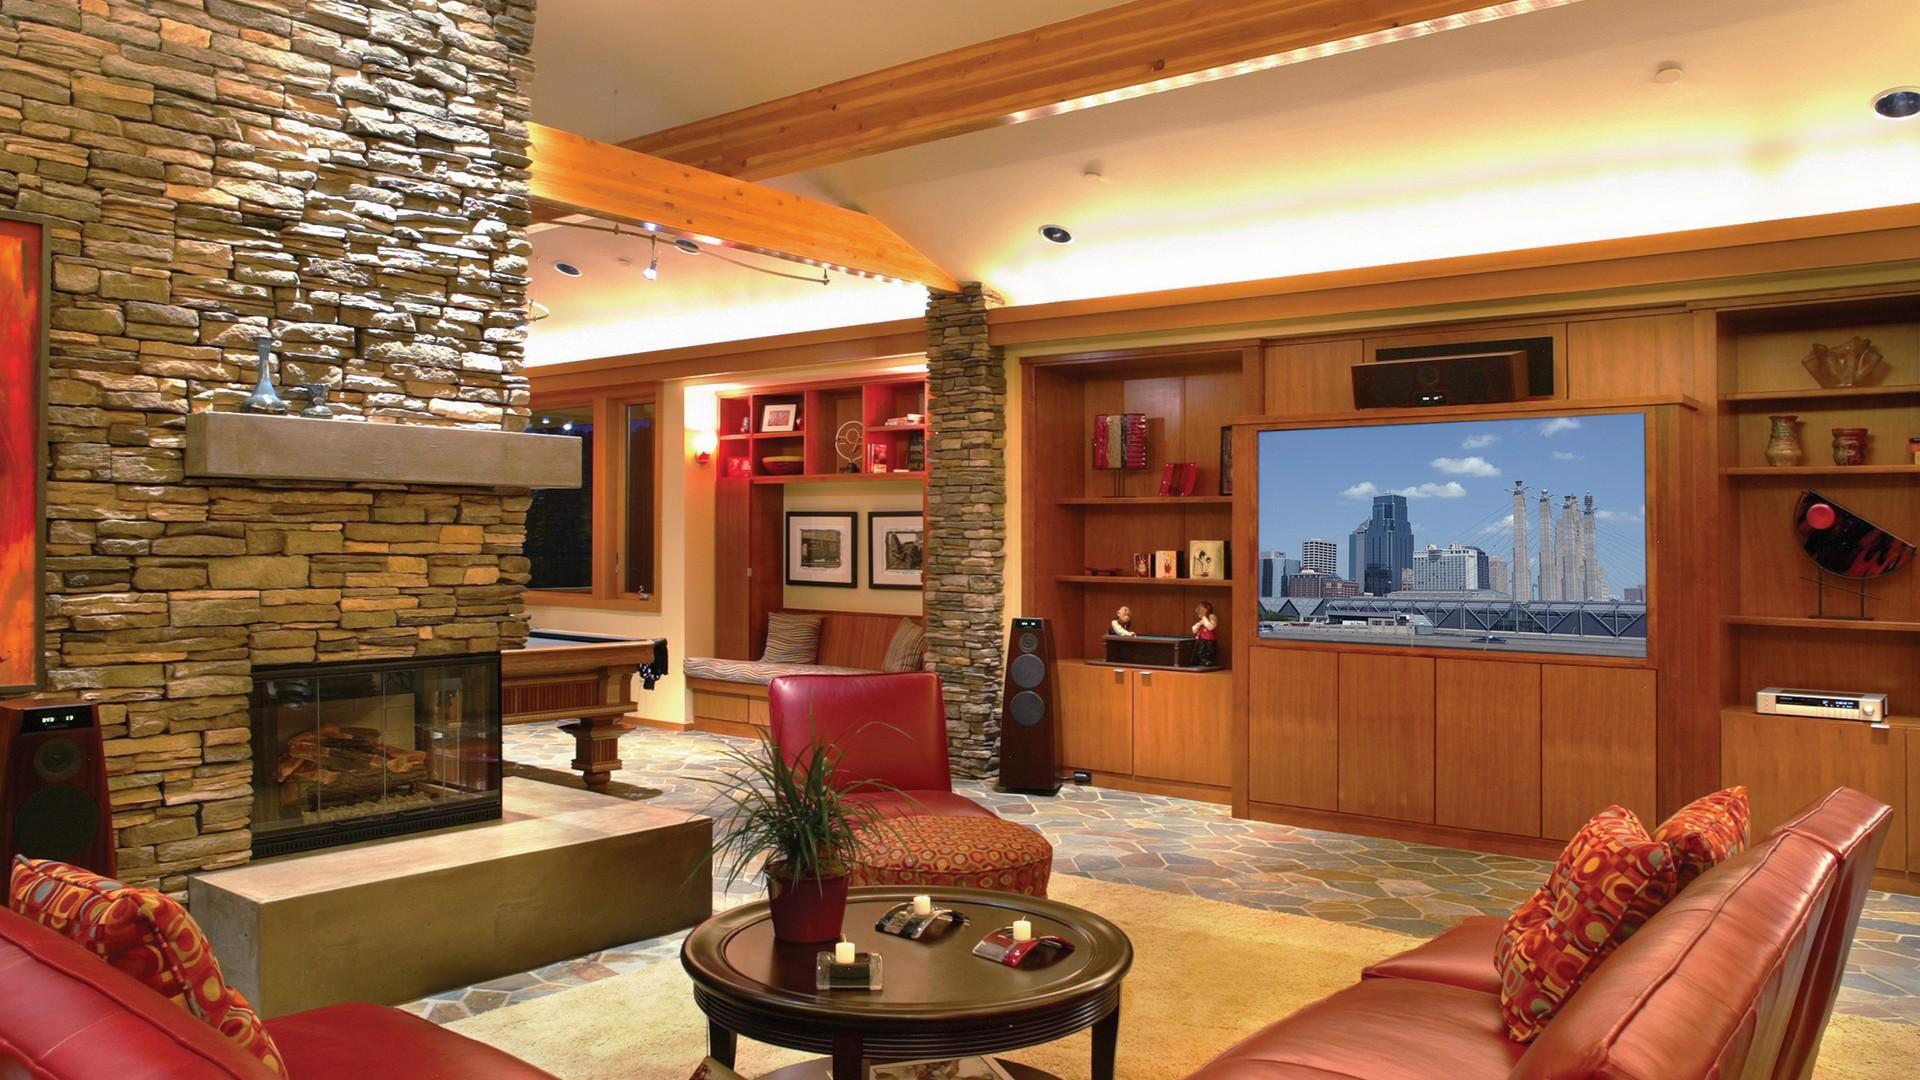 Contemporary House Plan 1412 The Harrisburg 5628 Sqft 5